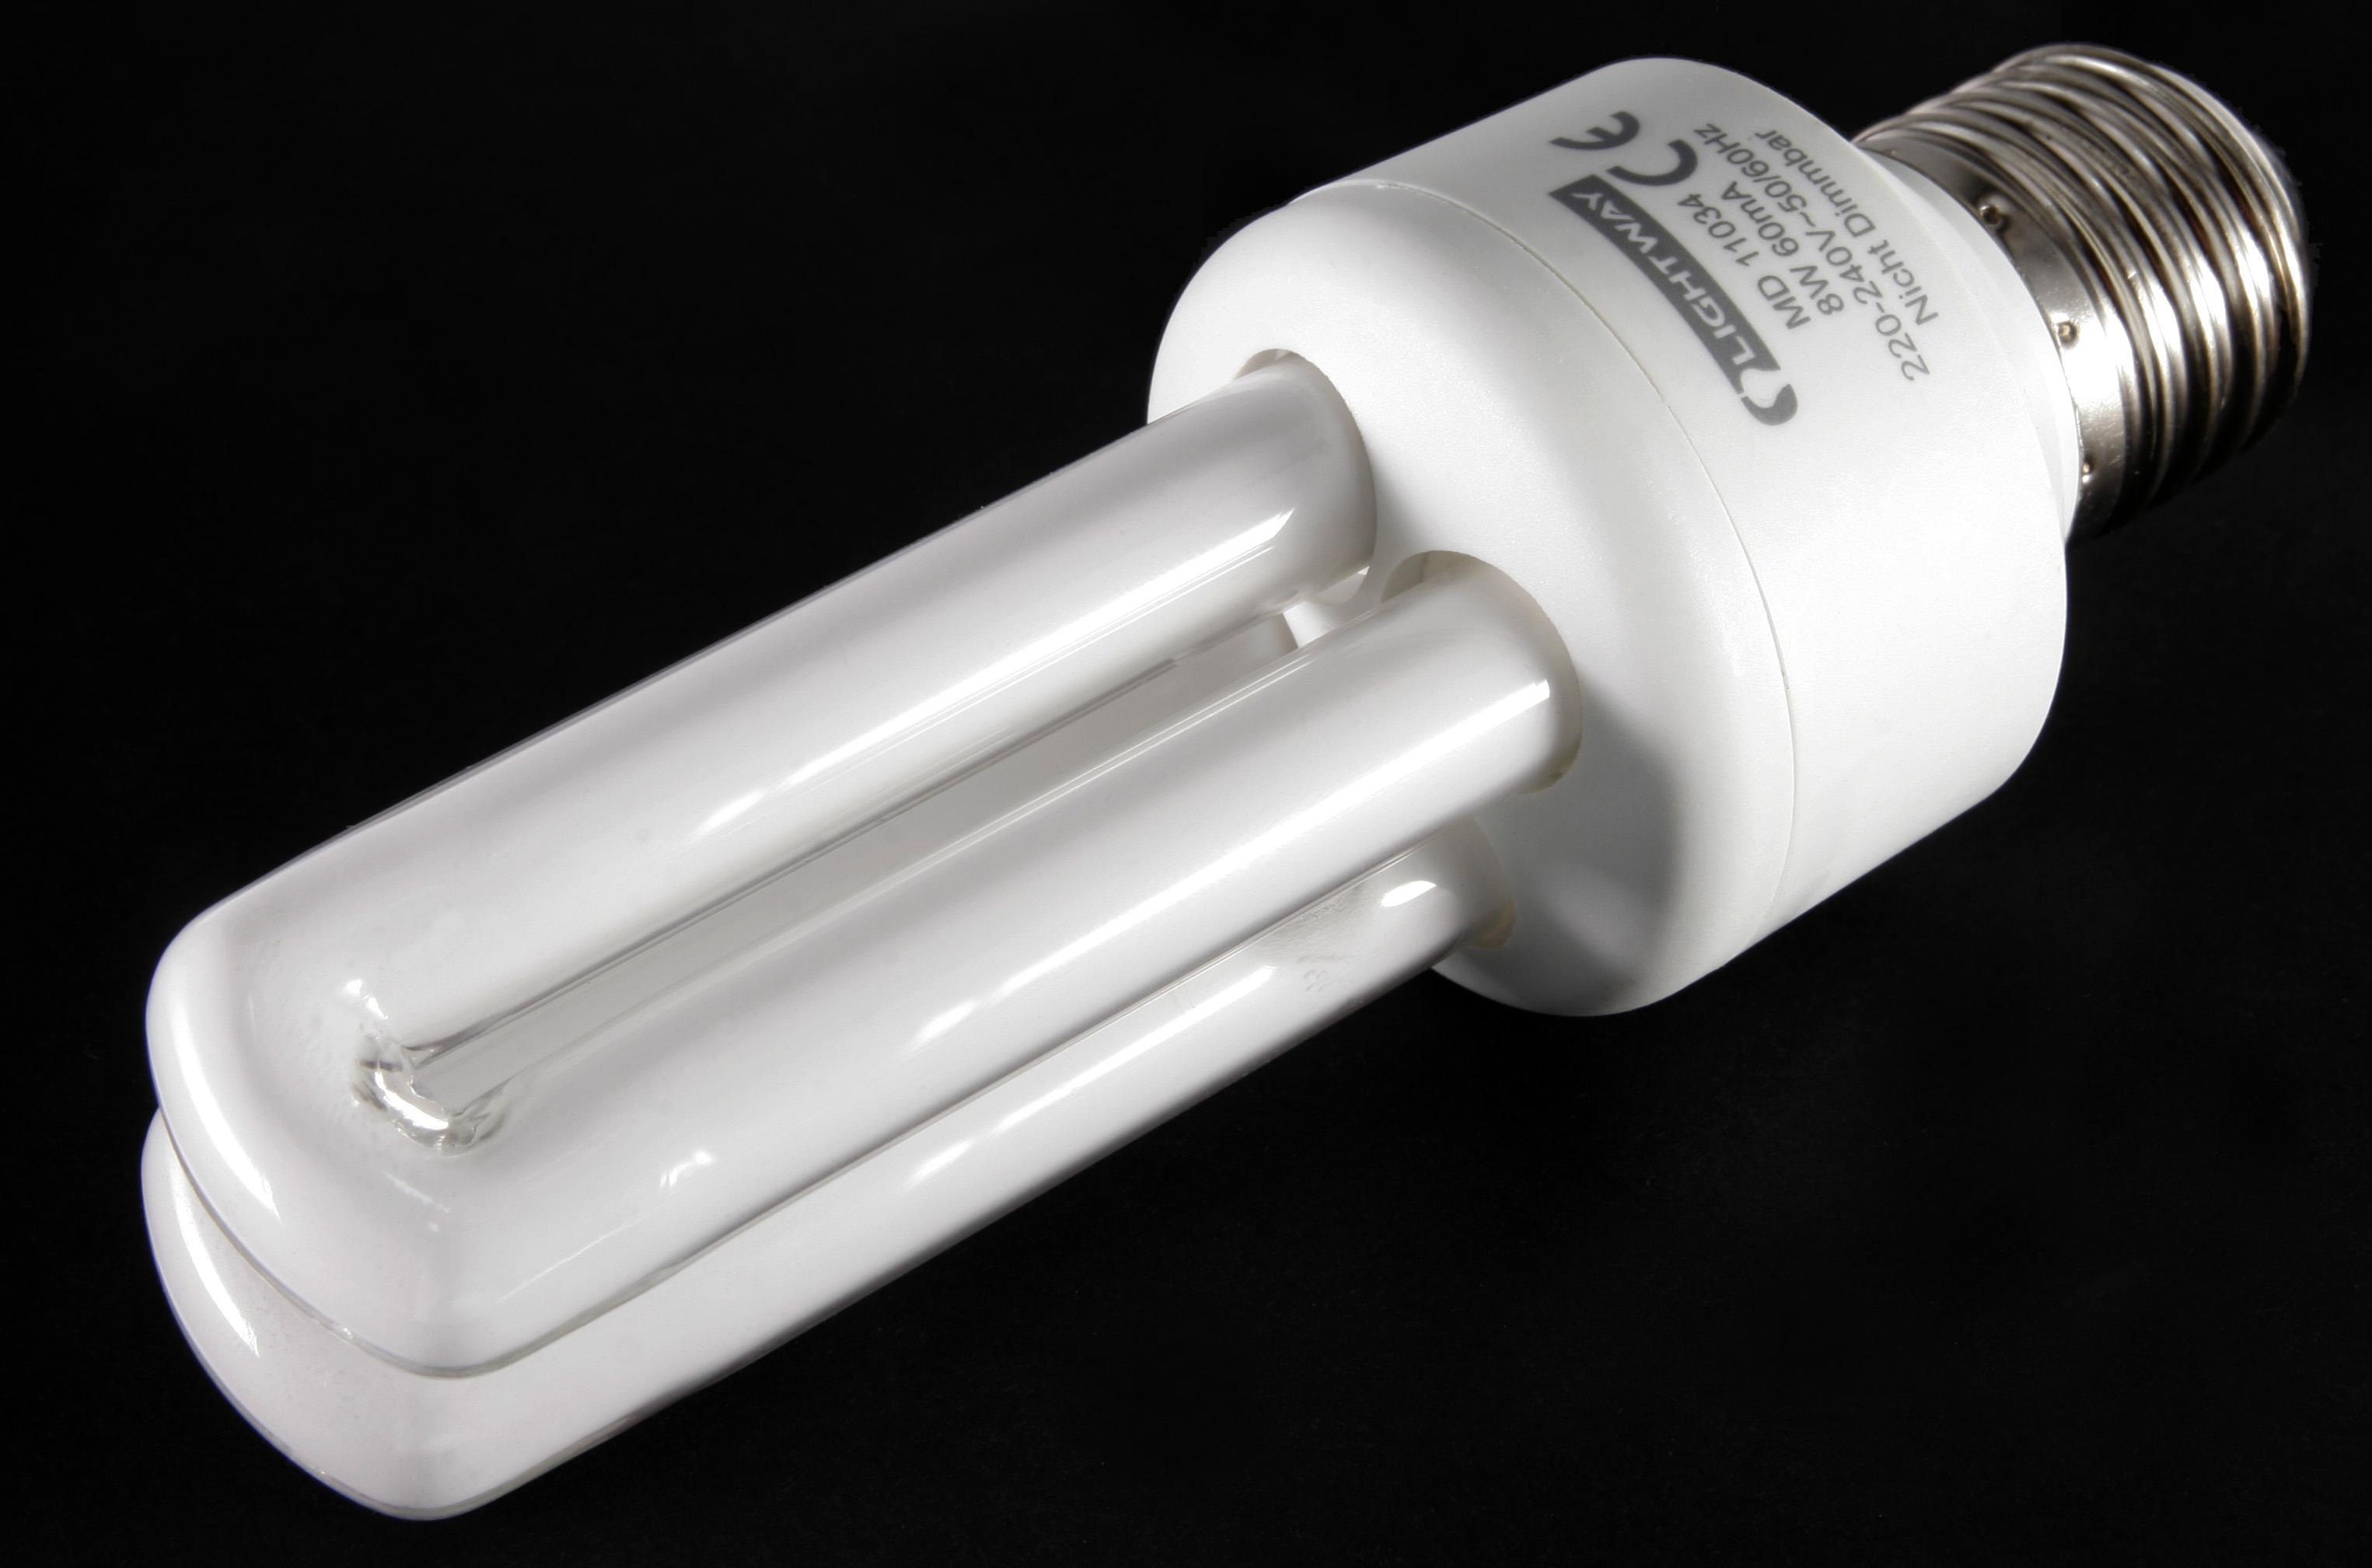 Pourquoi Ampoules RecyclerRecupel Pourquoi Ampoules Pourquoi Ampoules Ampoules RecyclerRecupel RecyclerRecupel Jl1FKc